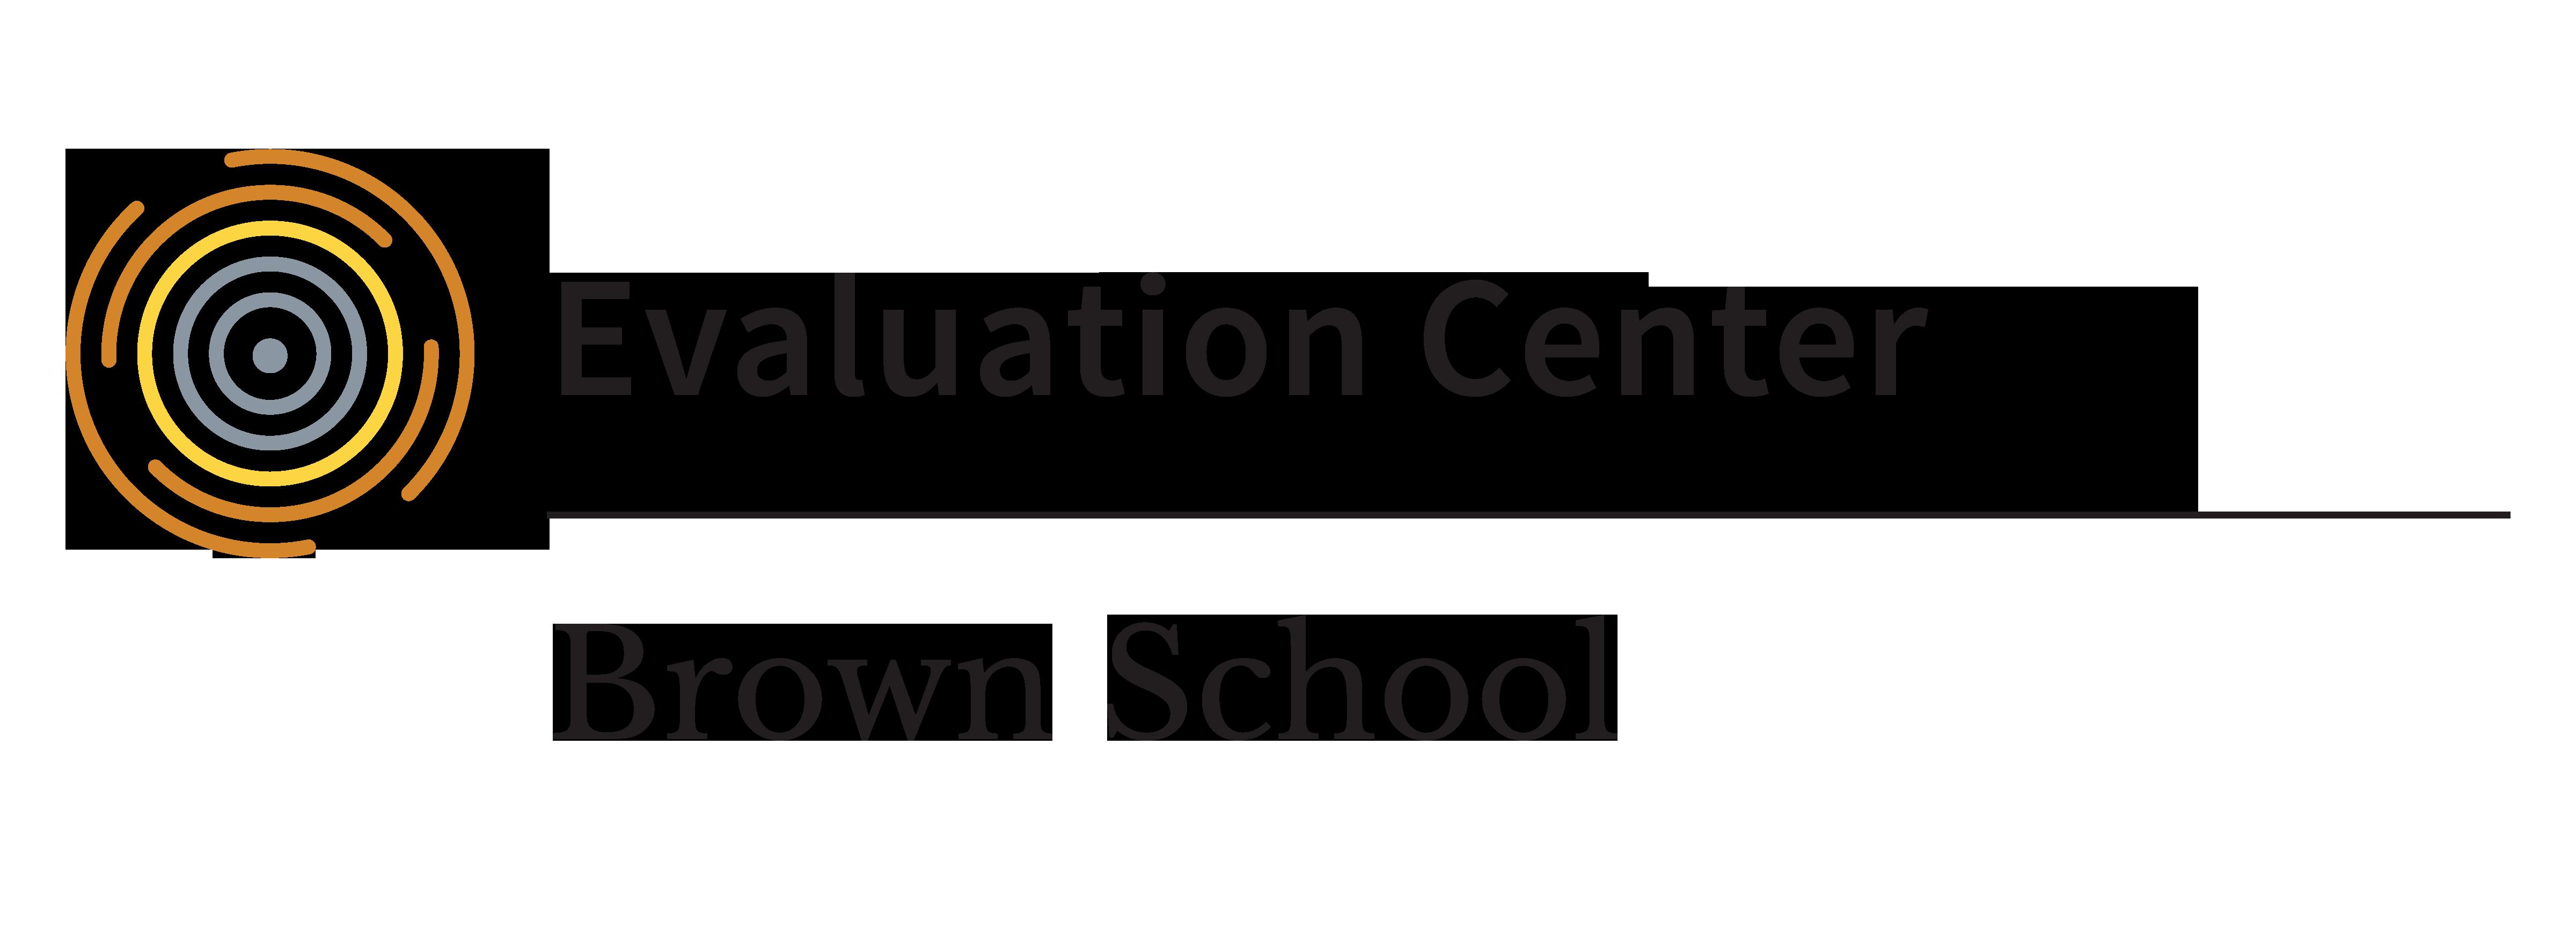 Evaluation Center